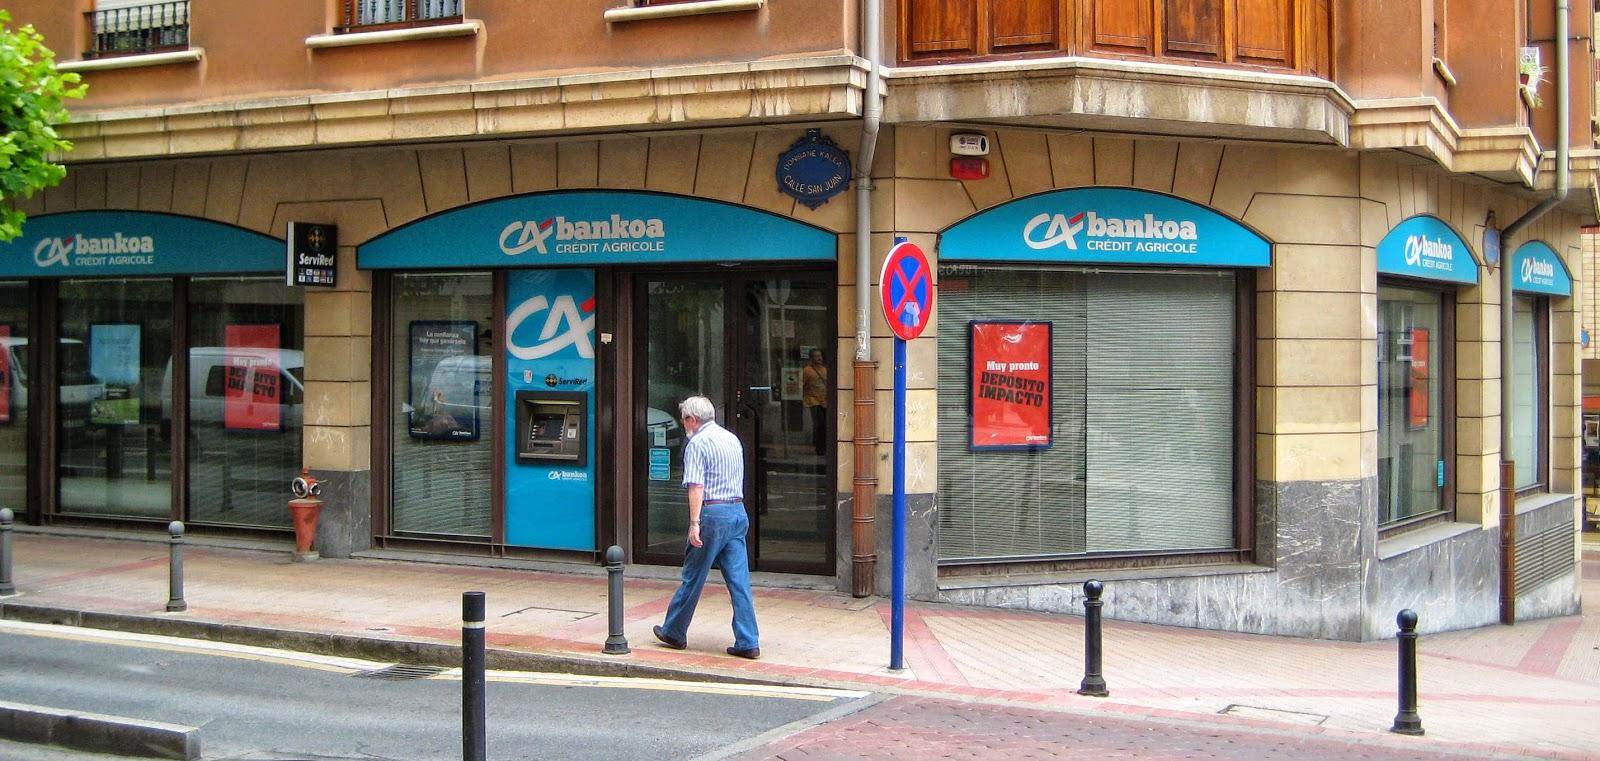 Bankoa credito